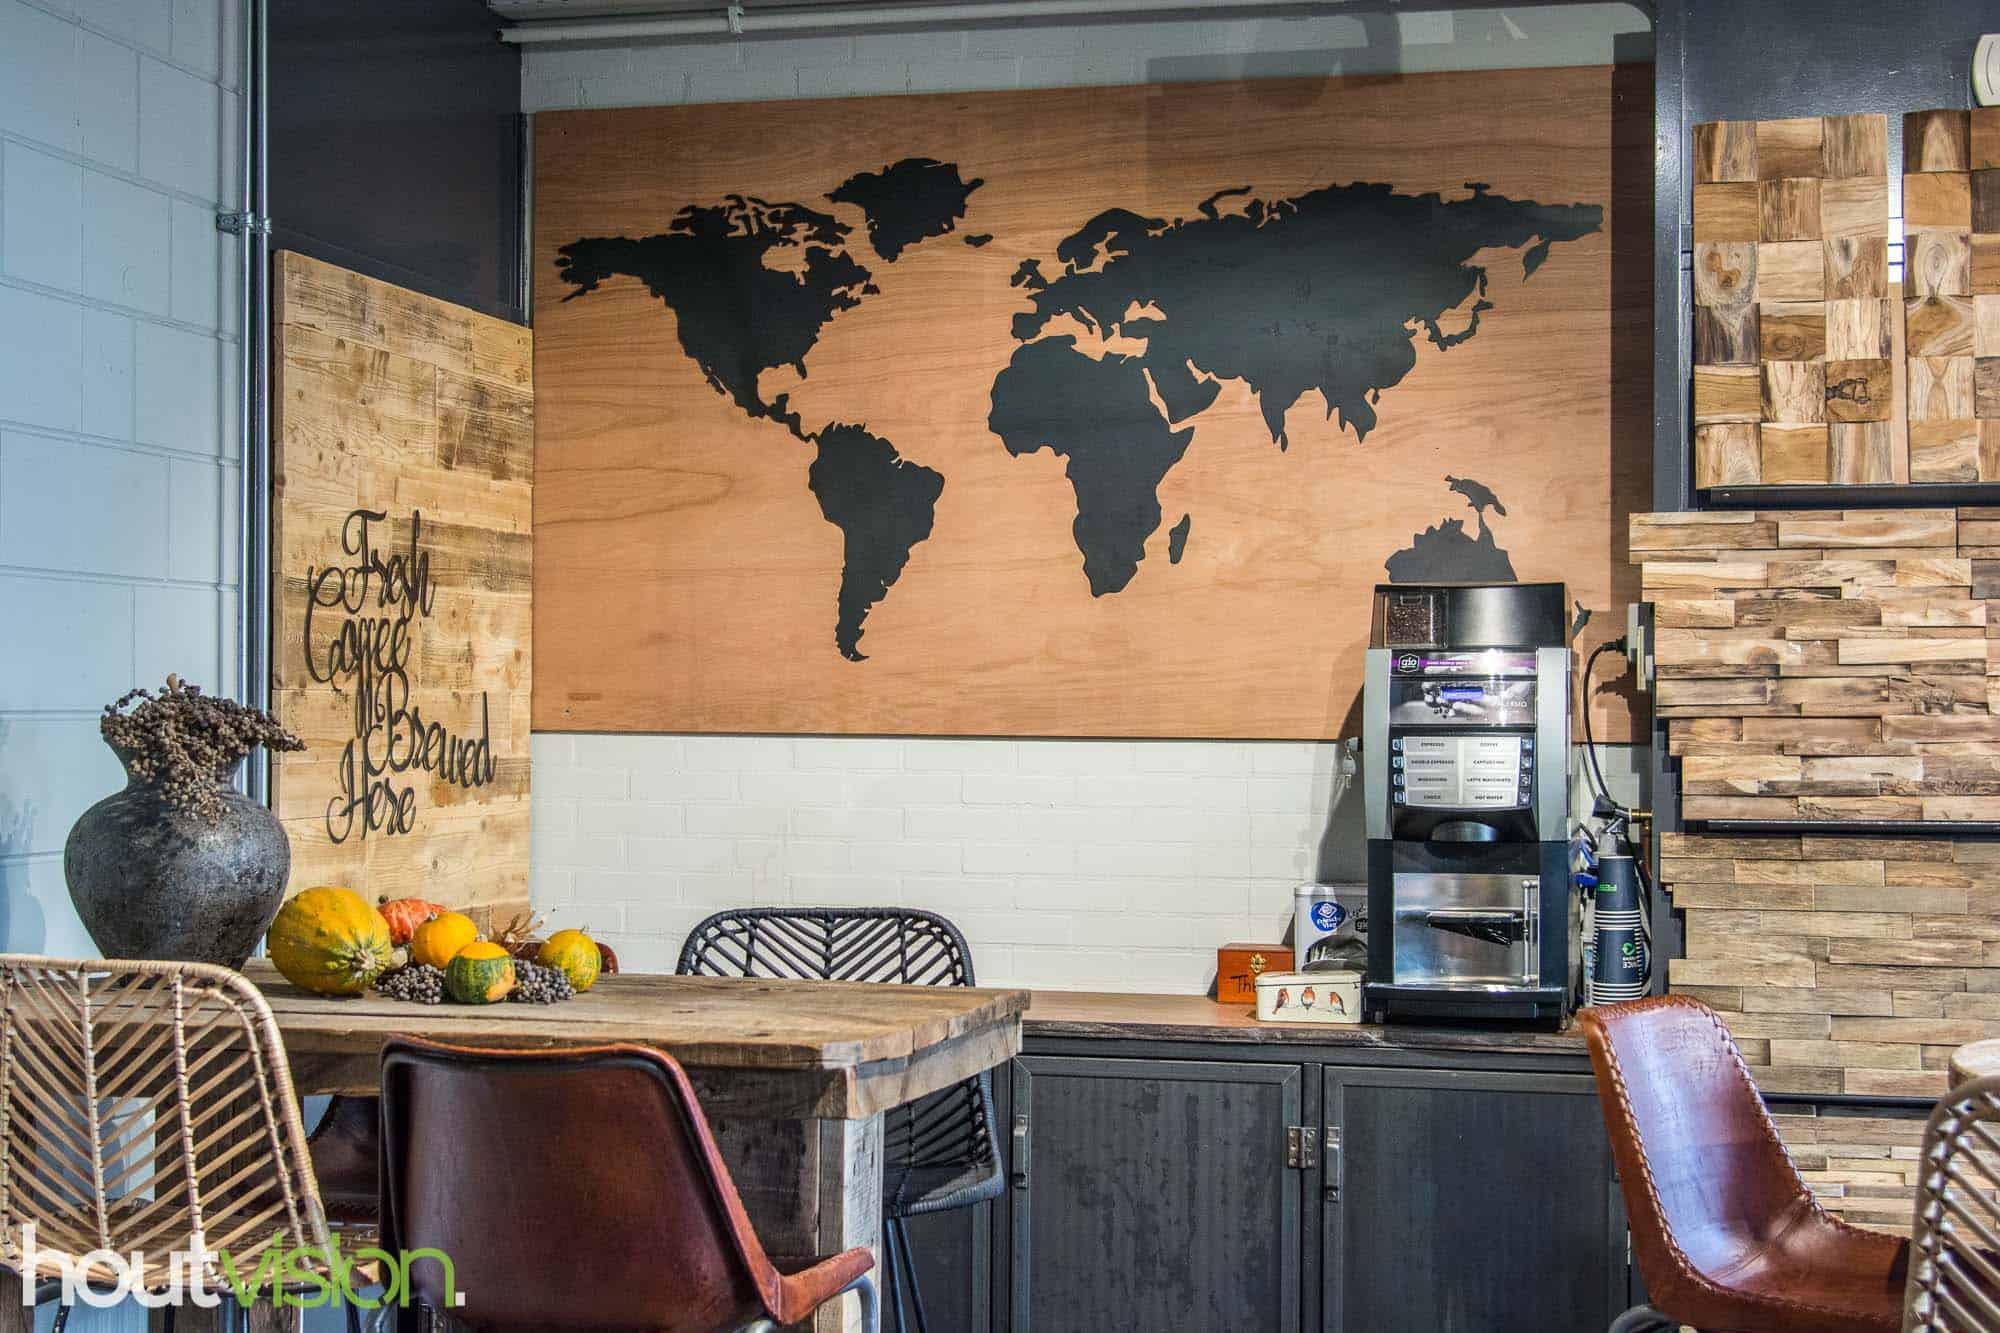 koffiecorner Houtvision, blauwstaal, wereldkaart, luxe hardhout meerpalen dressoir, bartafel sloophout